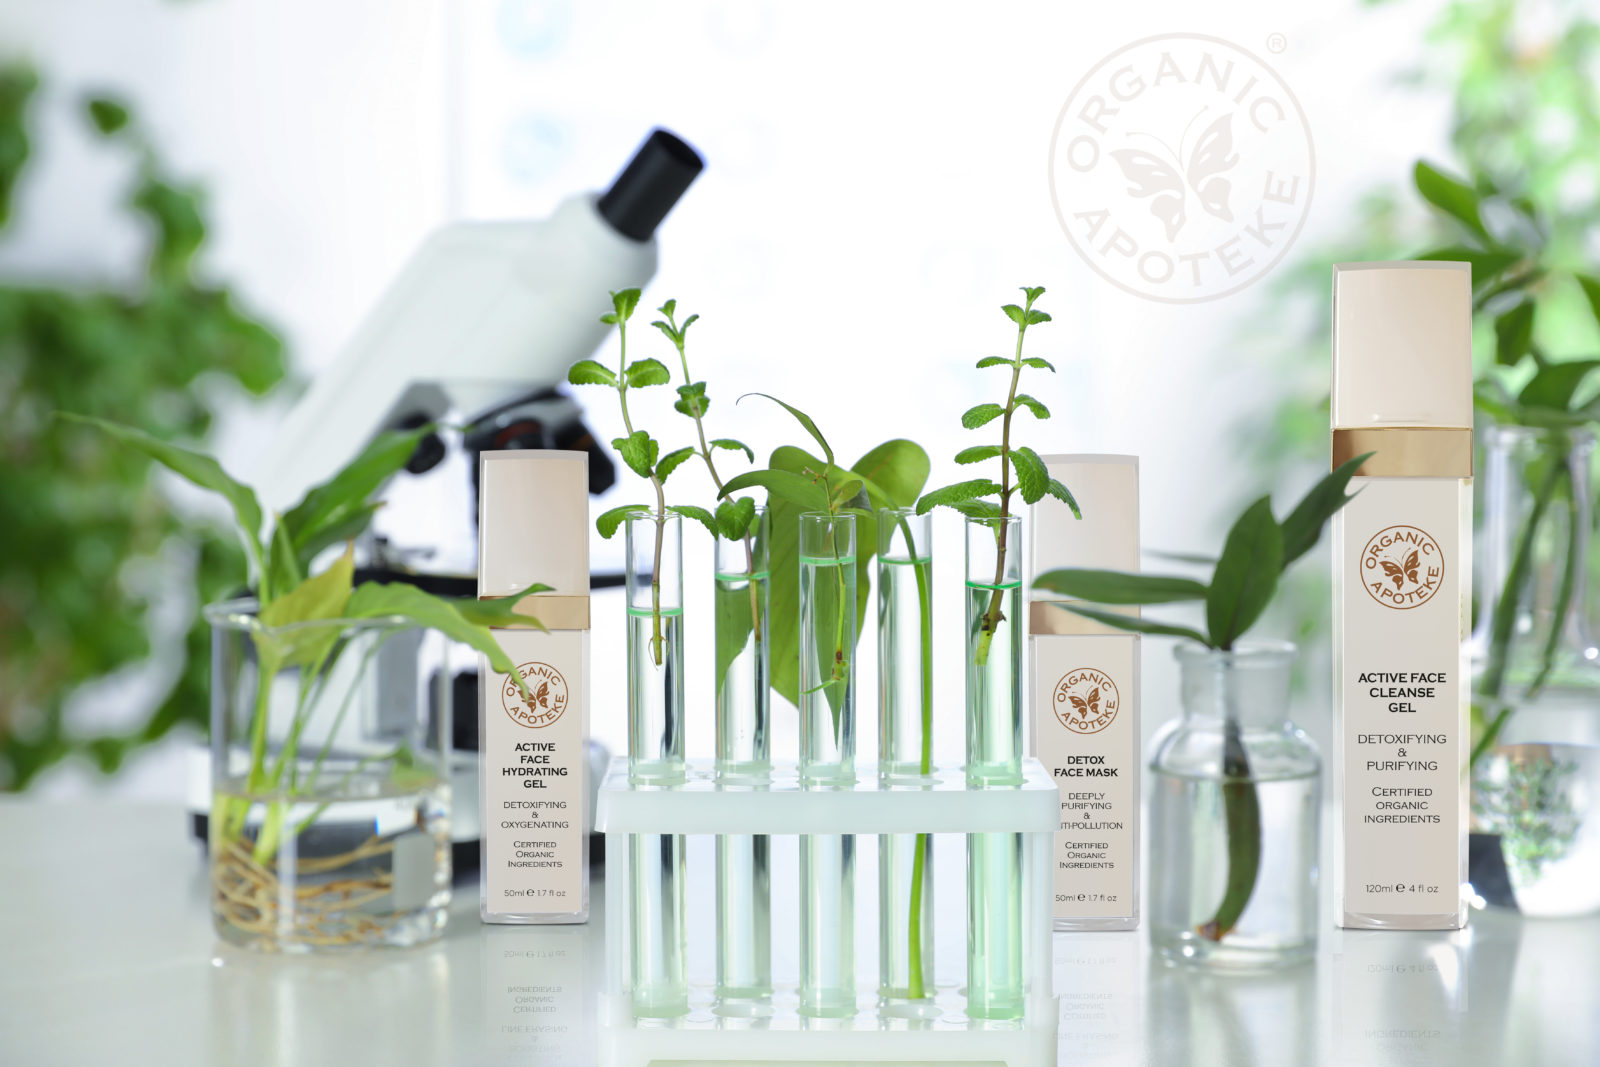 Science behind Organic Apoteke